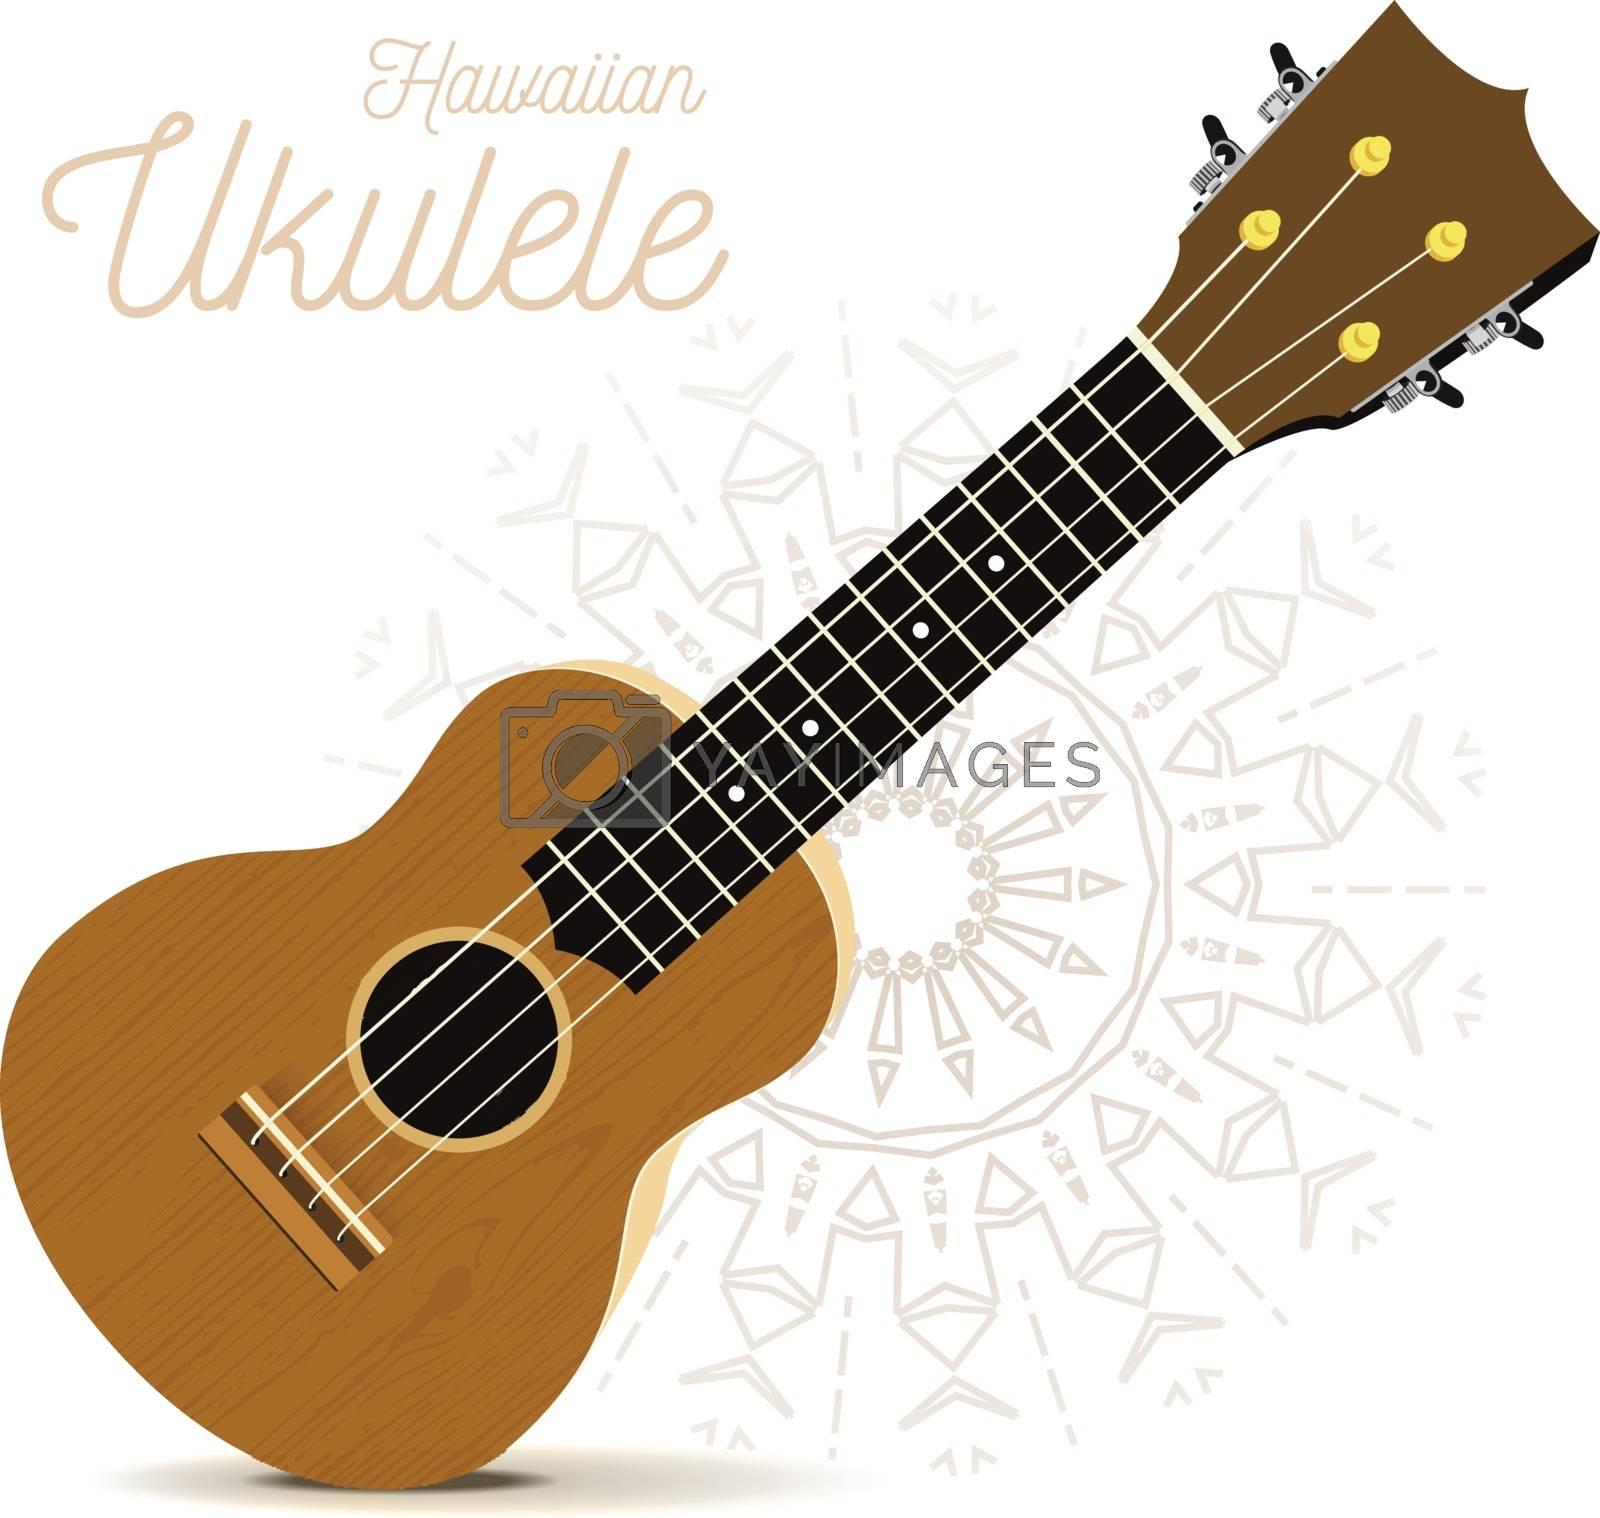 Ukulele - Hawaiian musical instrument. Vector illustration on white by sermax55